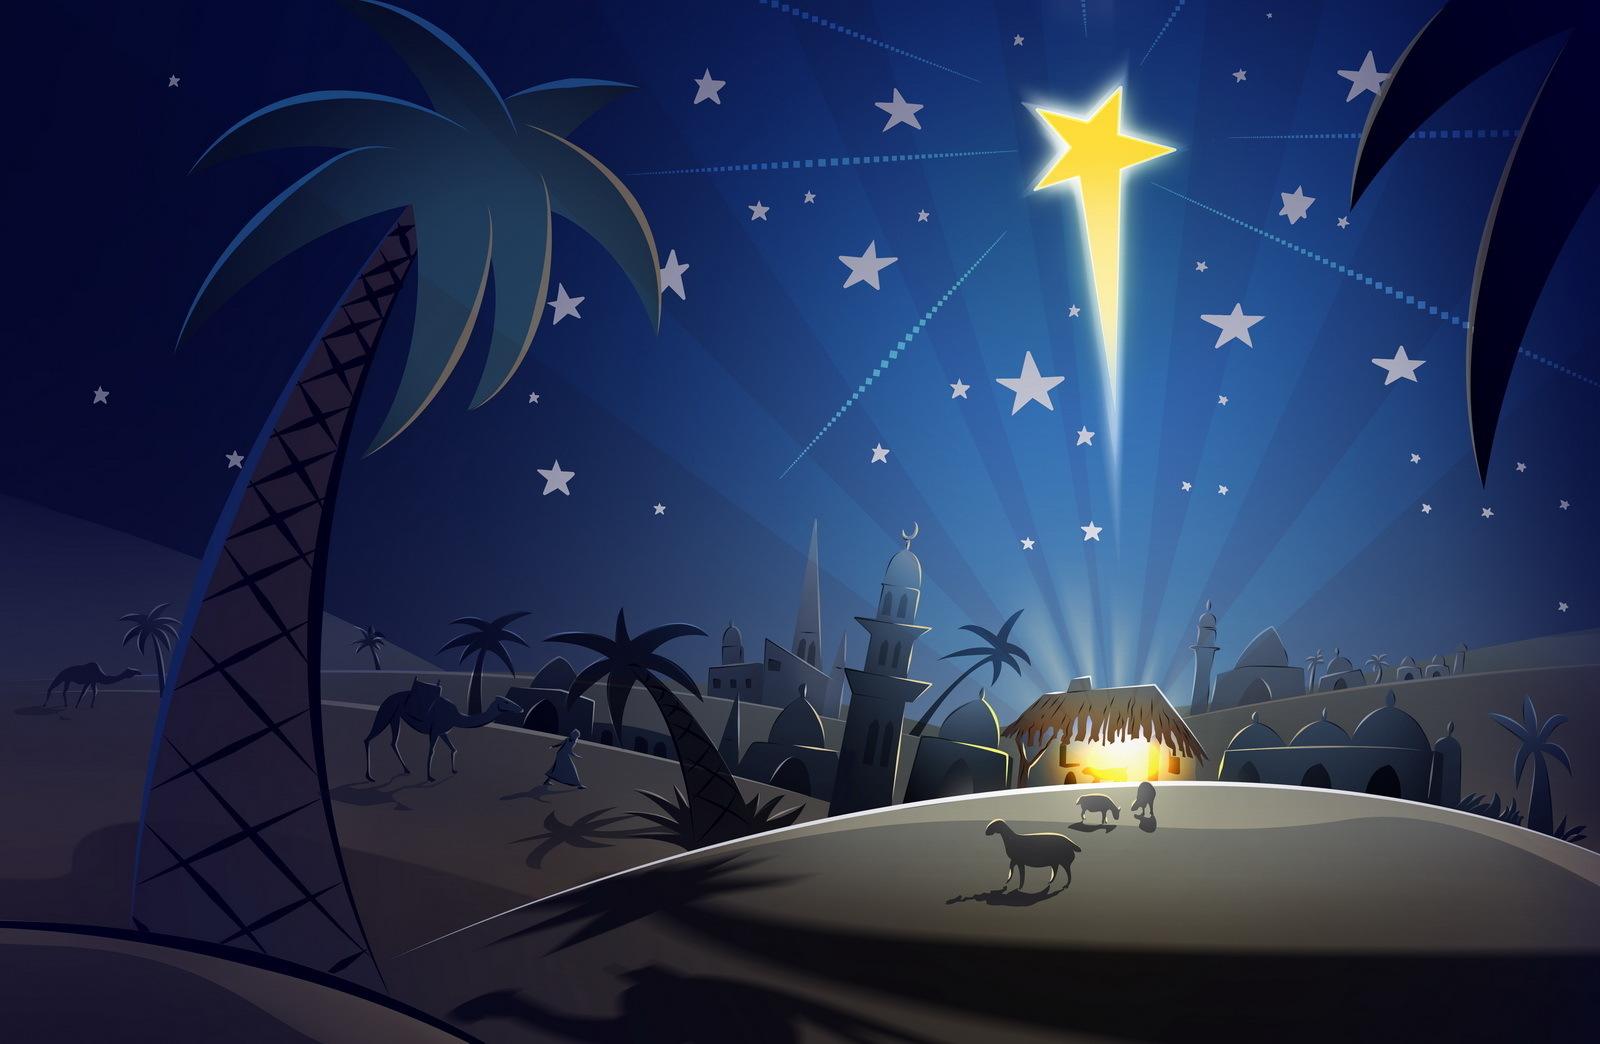 Star Bright - Christmas Photo (16227730) - Fanpop